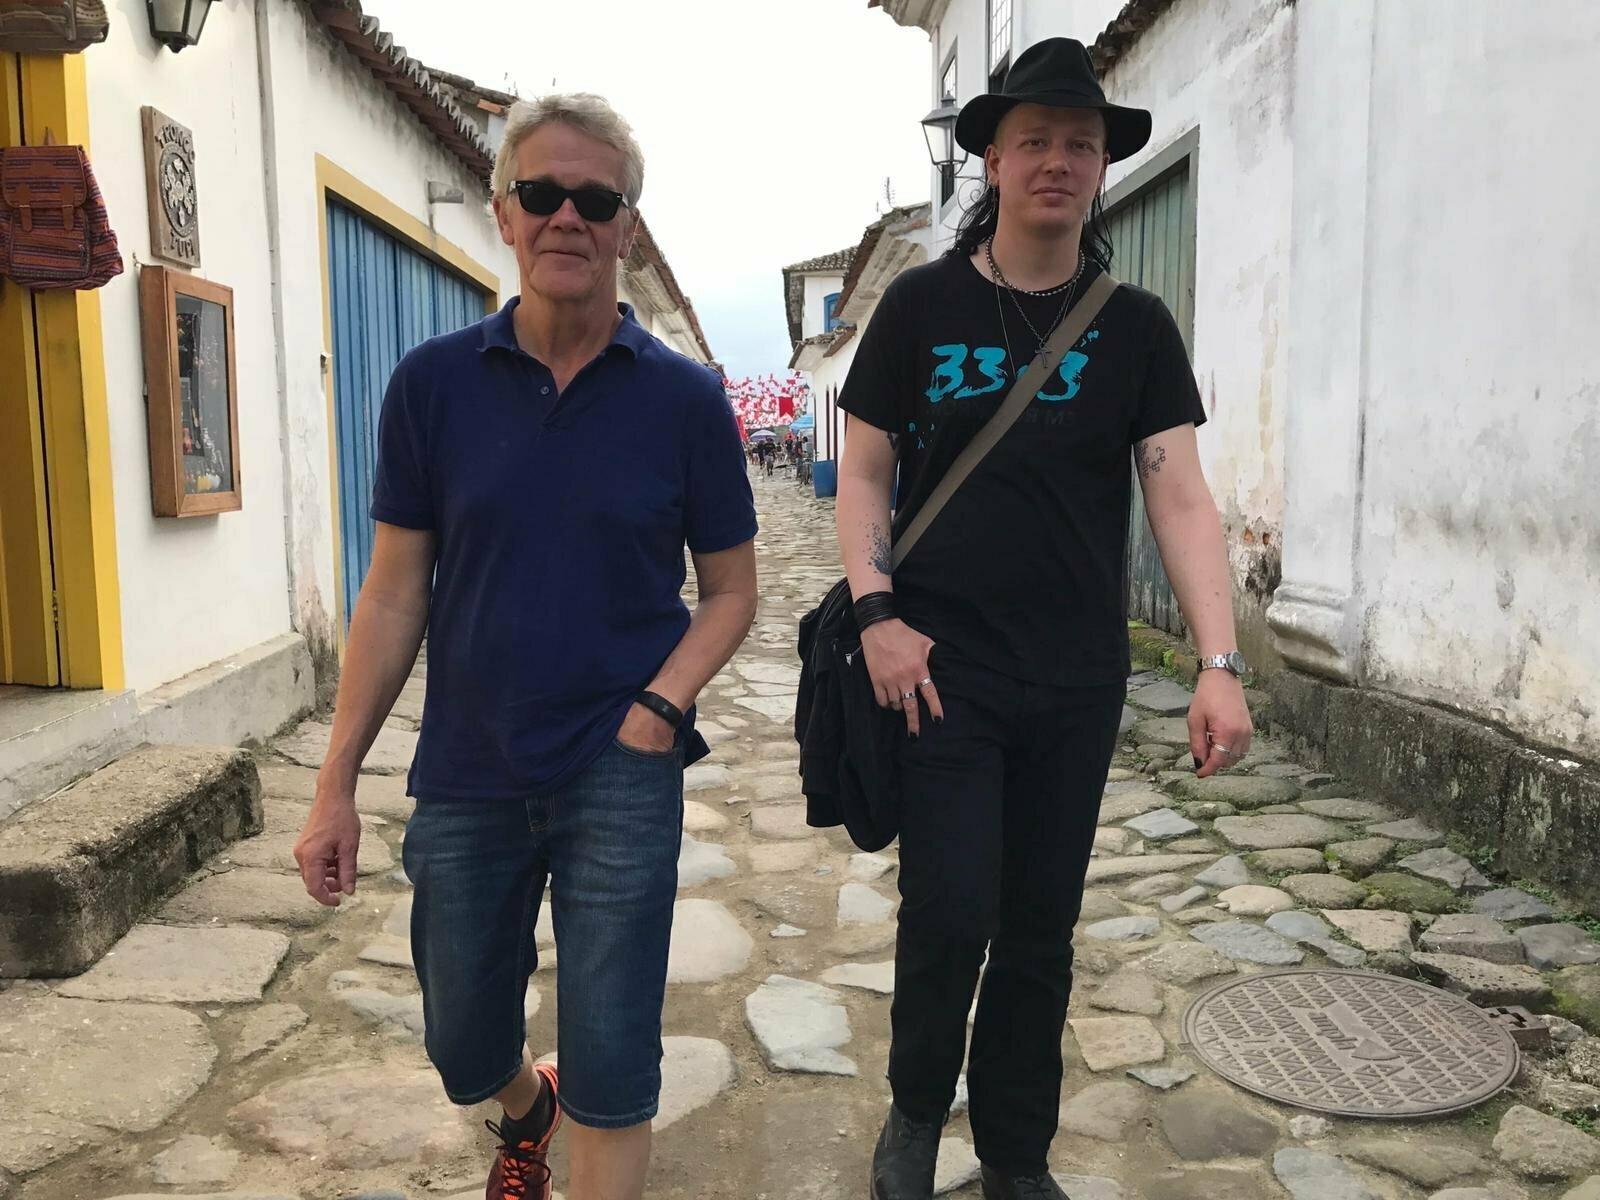 'War against knowledge': Julian Assange ally fights hacking arrest in Ecuador